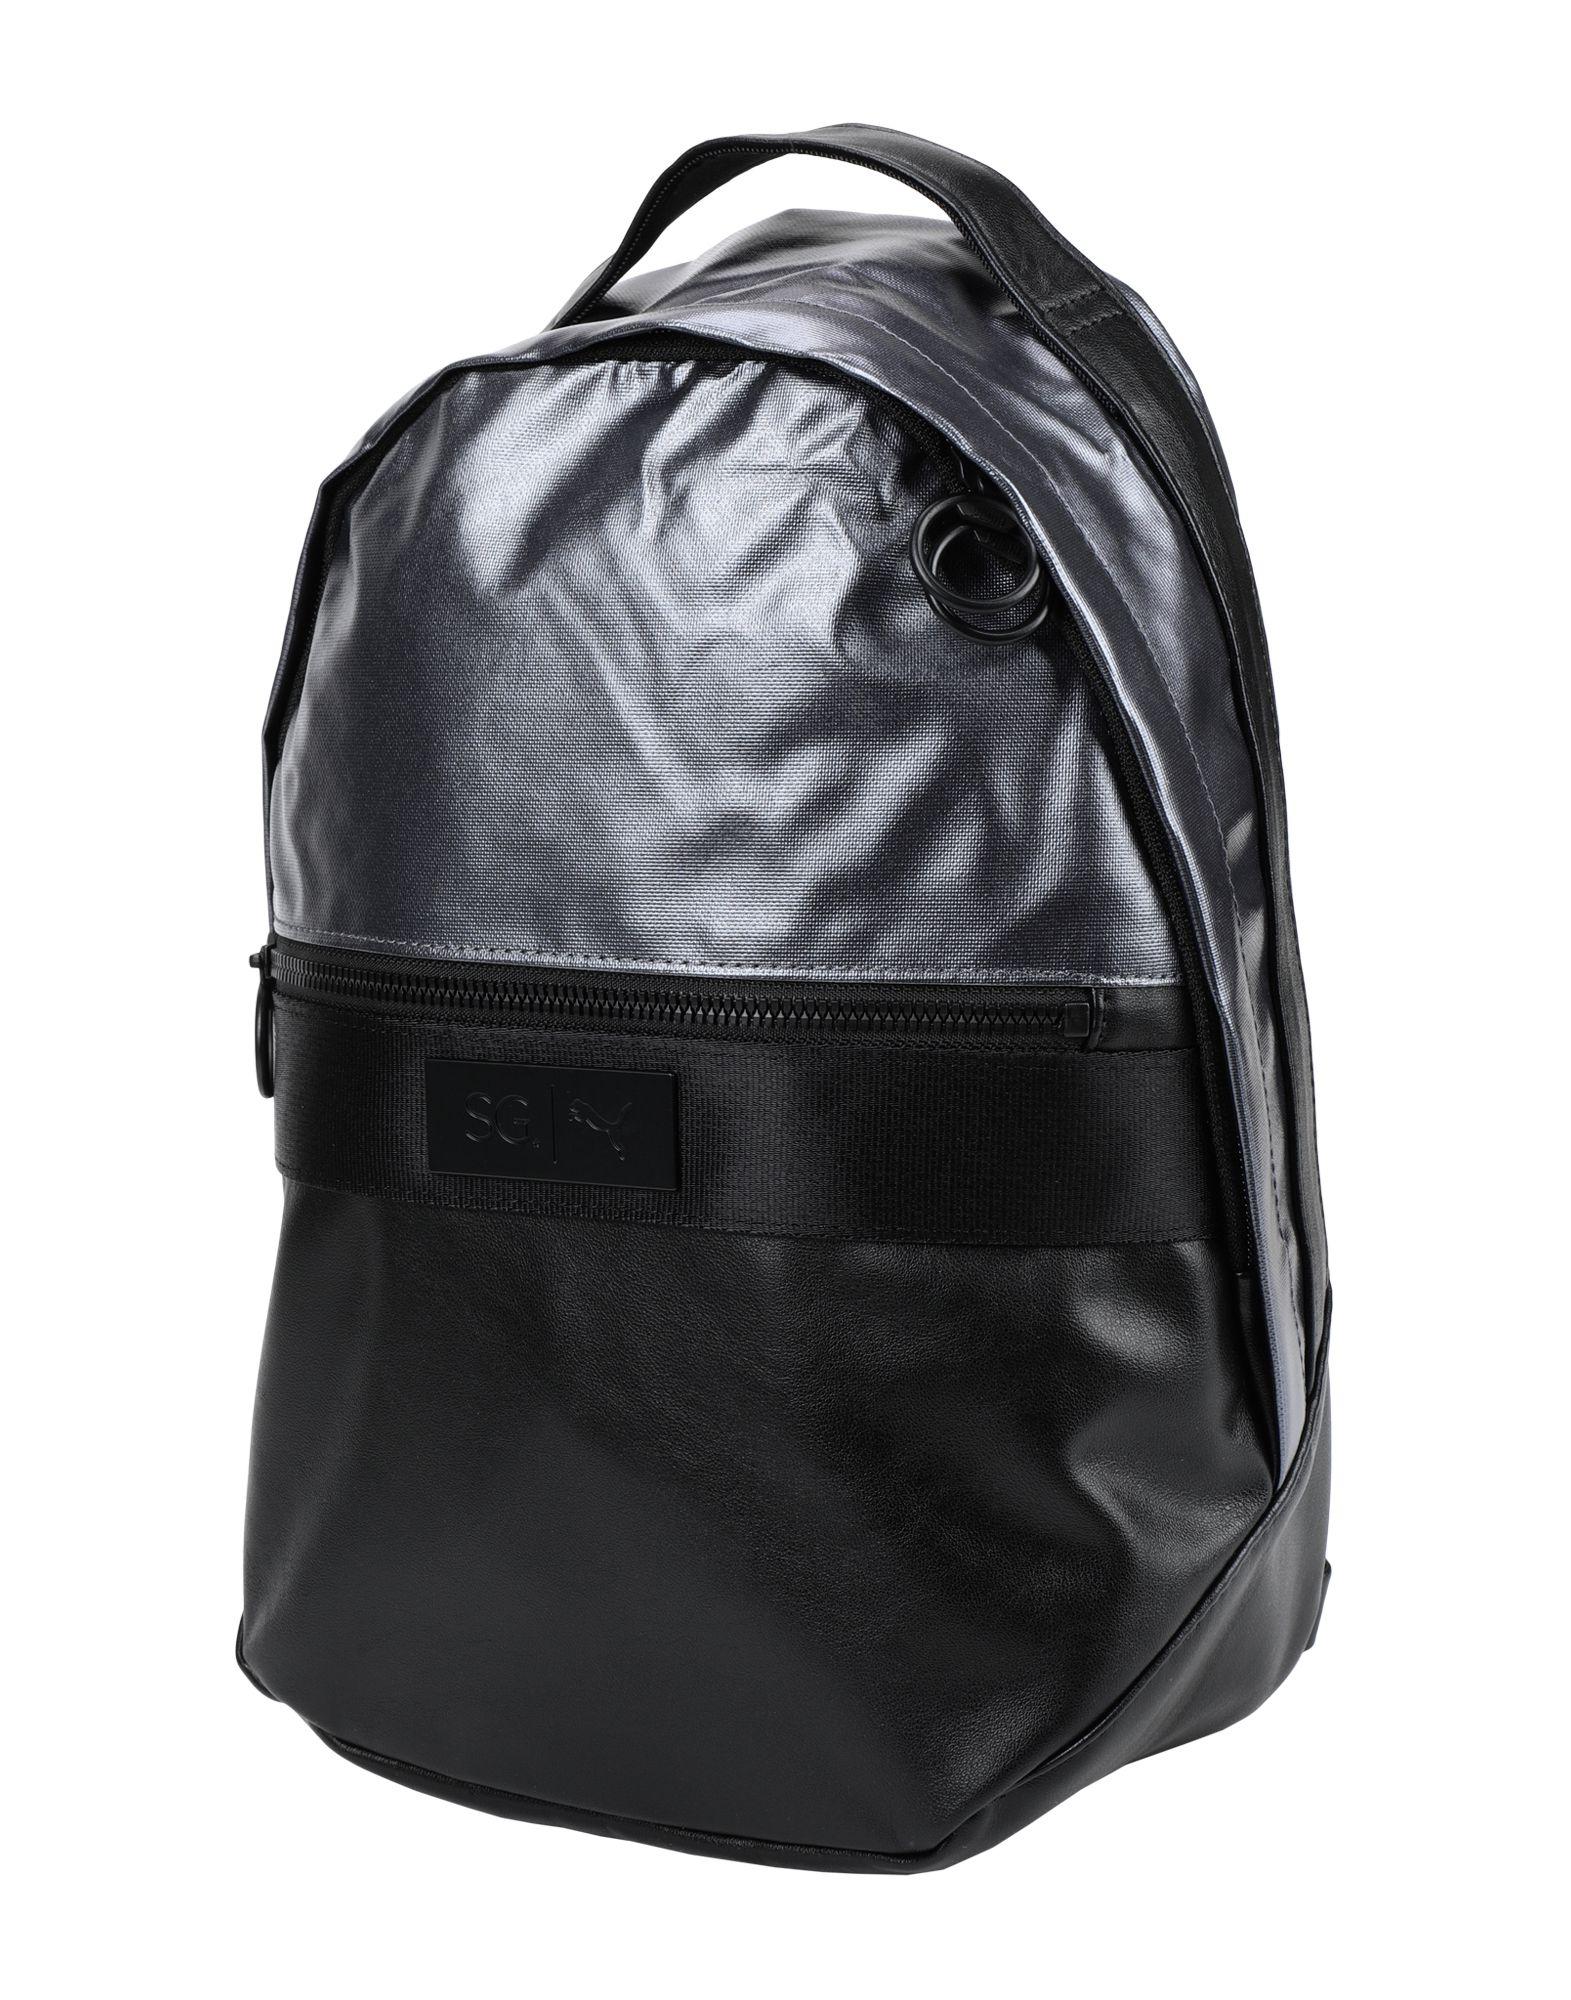 PUMA Рюкзаки и сумки на пояс сумки magnolia сумка женская a761 7363 лак искусственная кожа page 8